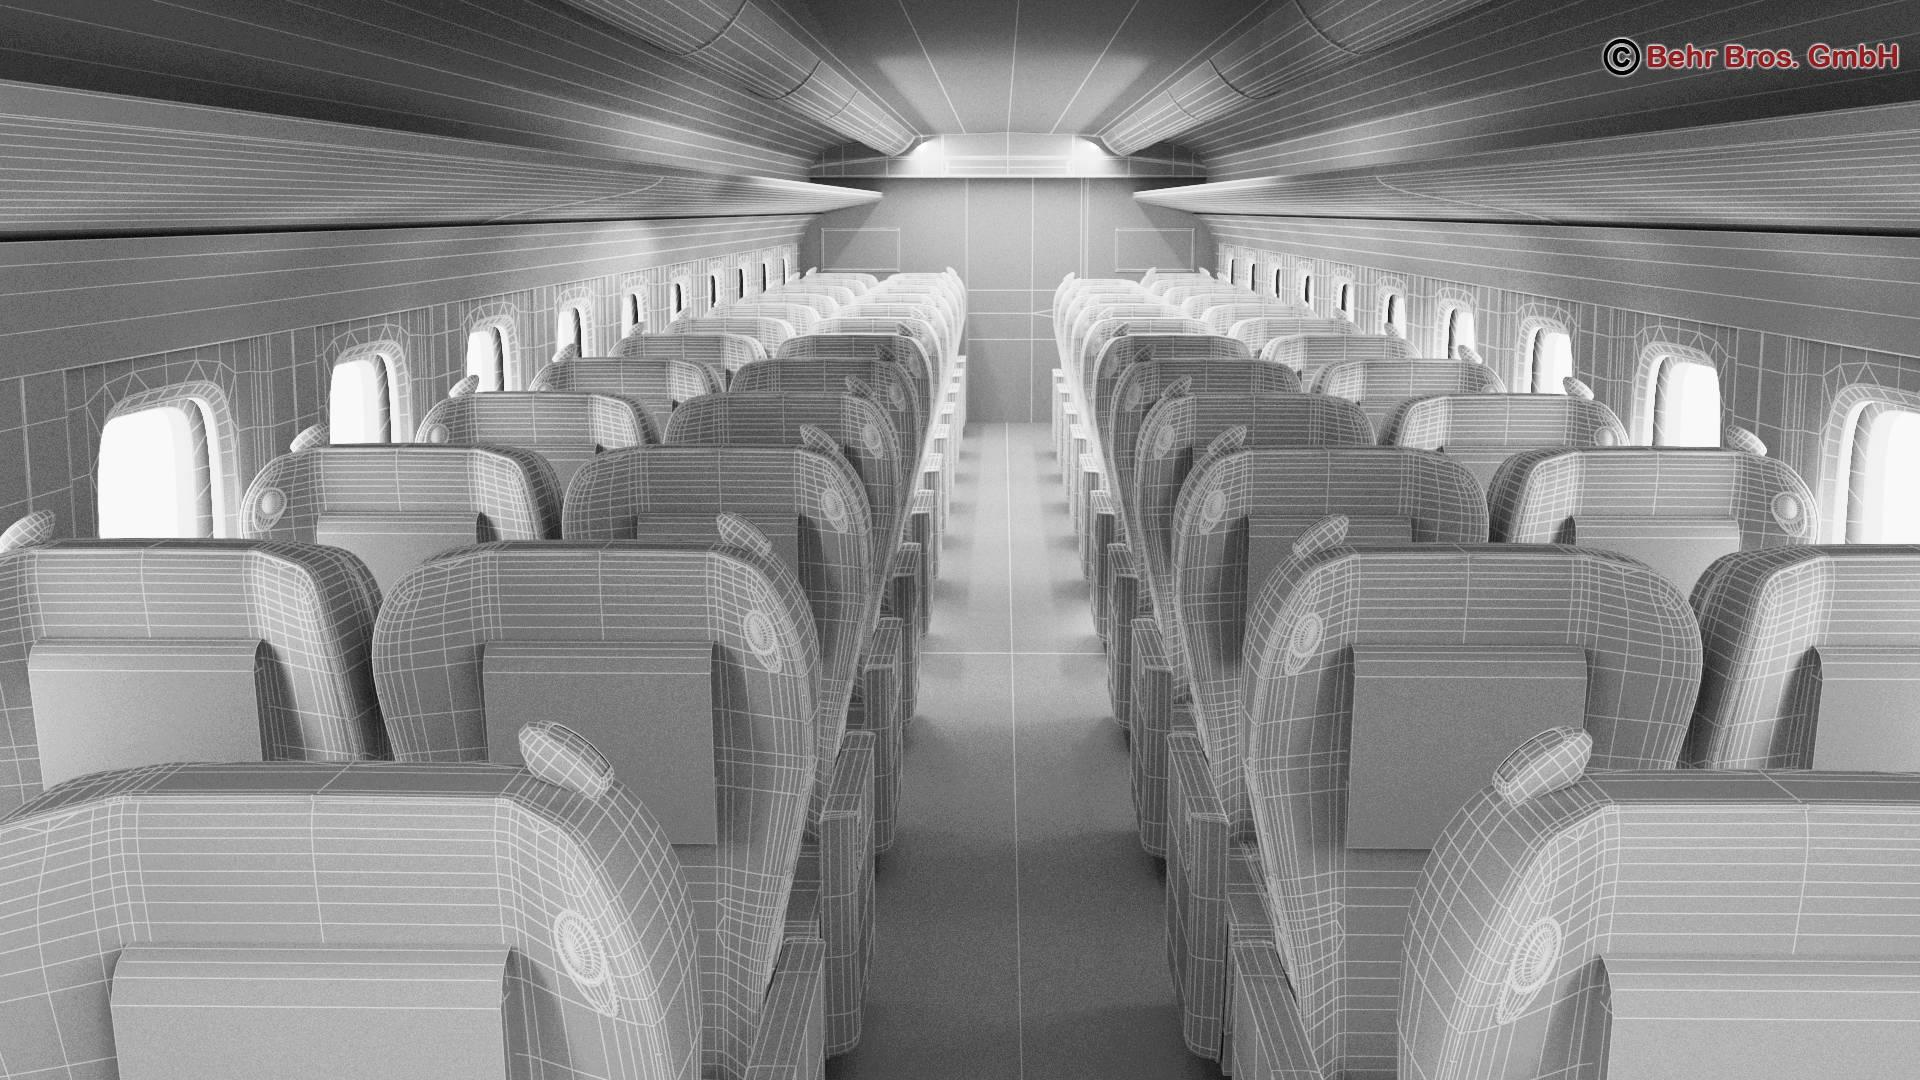 shinkansen e7 3d model 3ds max fbx c4d lwo ma mb obj 265688